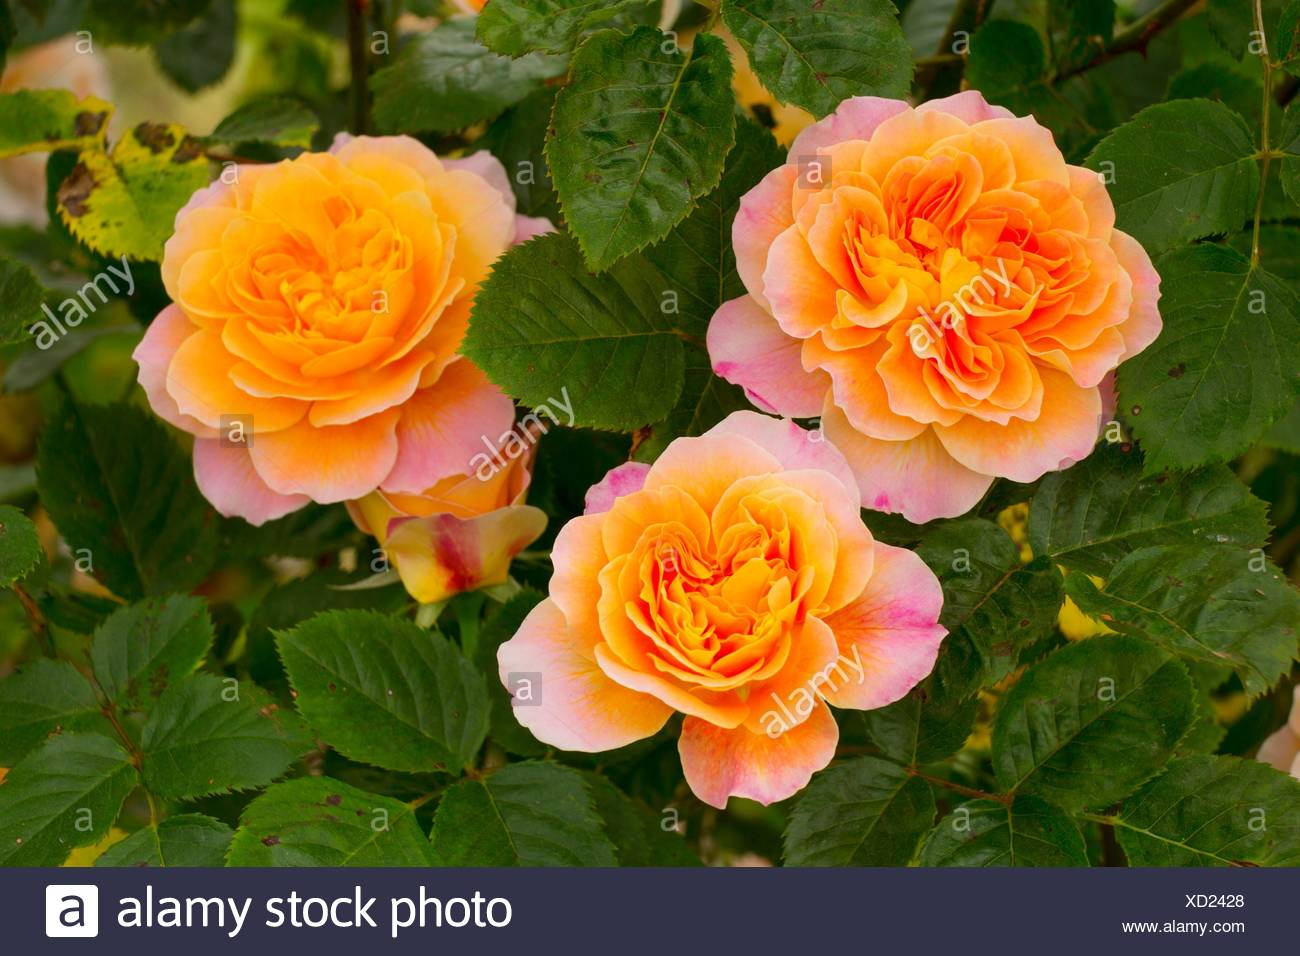 The Impressionist rose, Heirloom Roses, St Paul, Oregon. - Stock Image